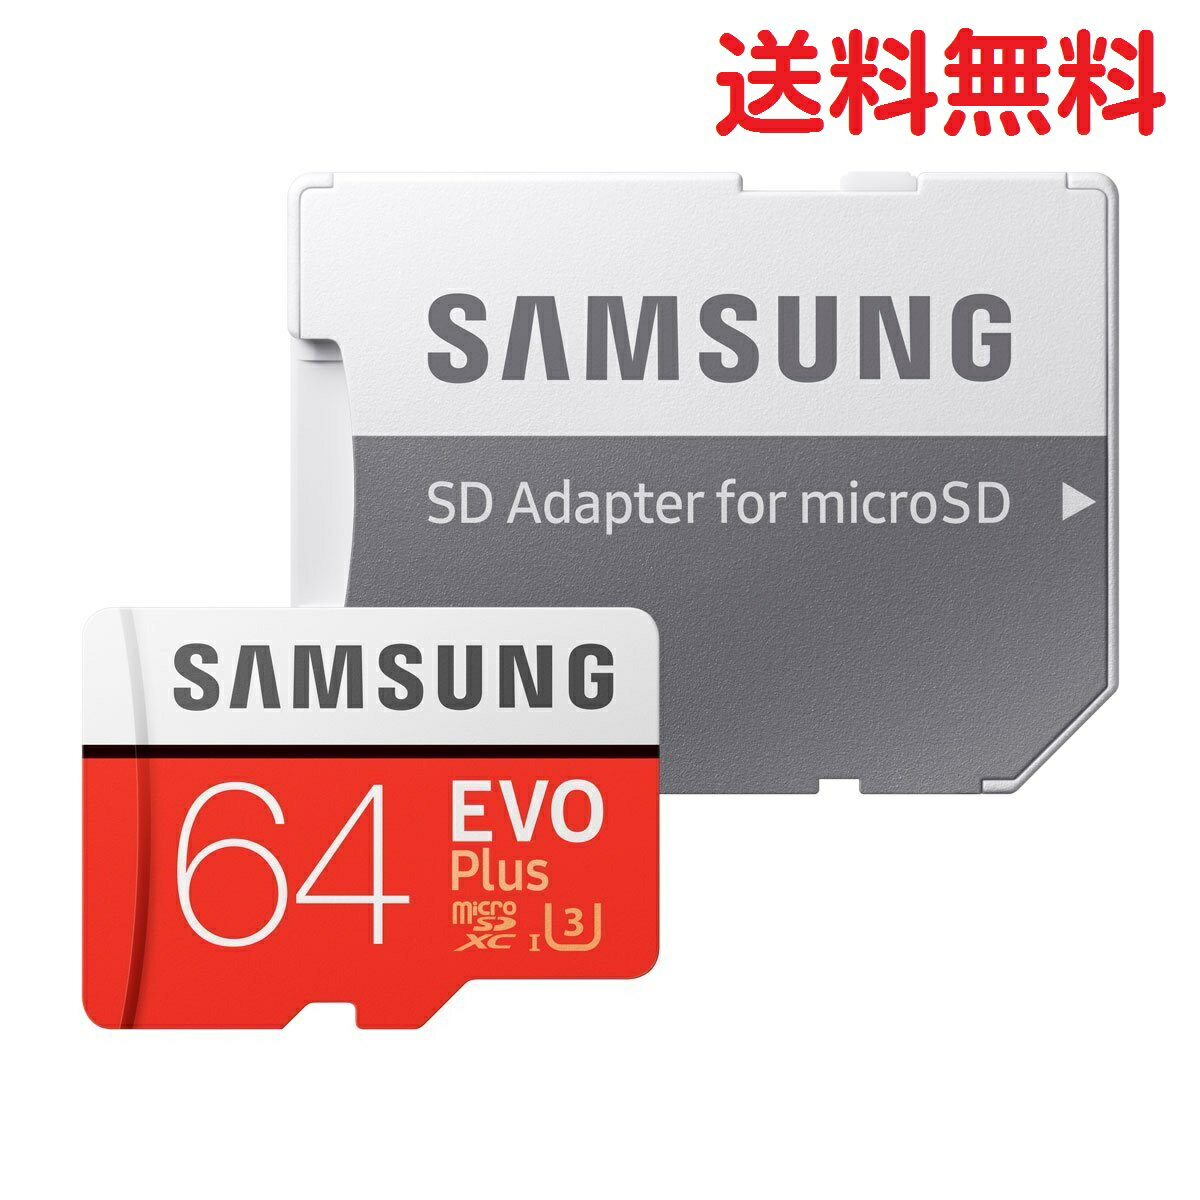 Samsung microSDXCカード 64GB EVO Plus Class10 UHS-I U3対応 (最大読出速度100MB/s:最大書込速度60MB/s) Nintendo Switch 動作確認済 MB-MC64GA/ECO 送料無料